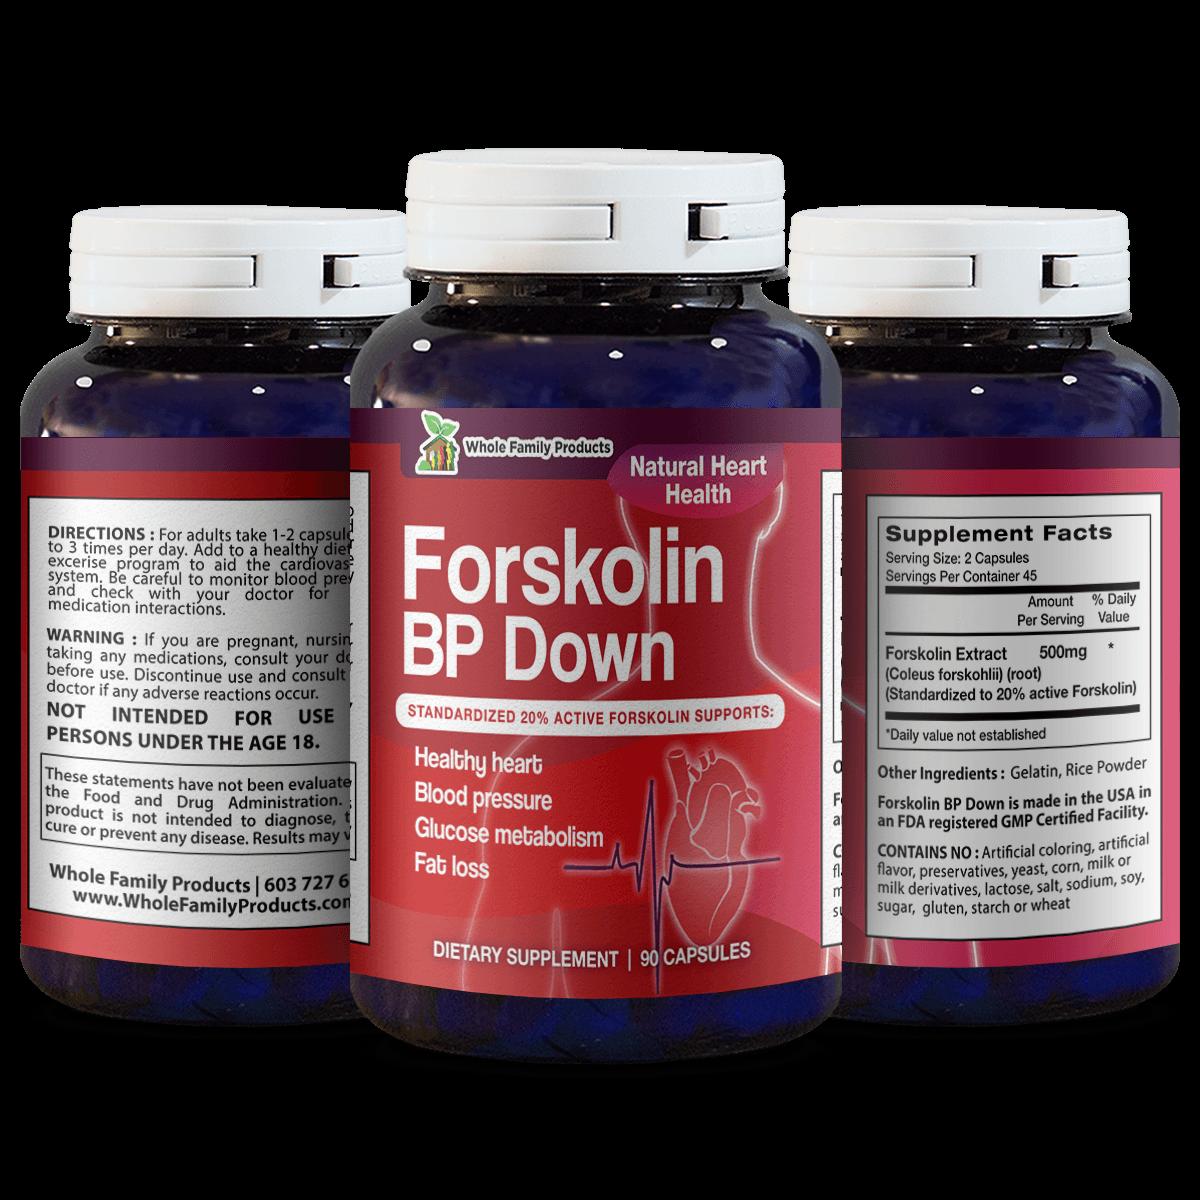 Forskolin BP Down 90 Capsules Natural Heart Health